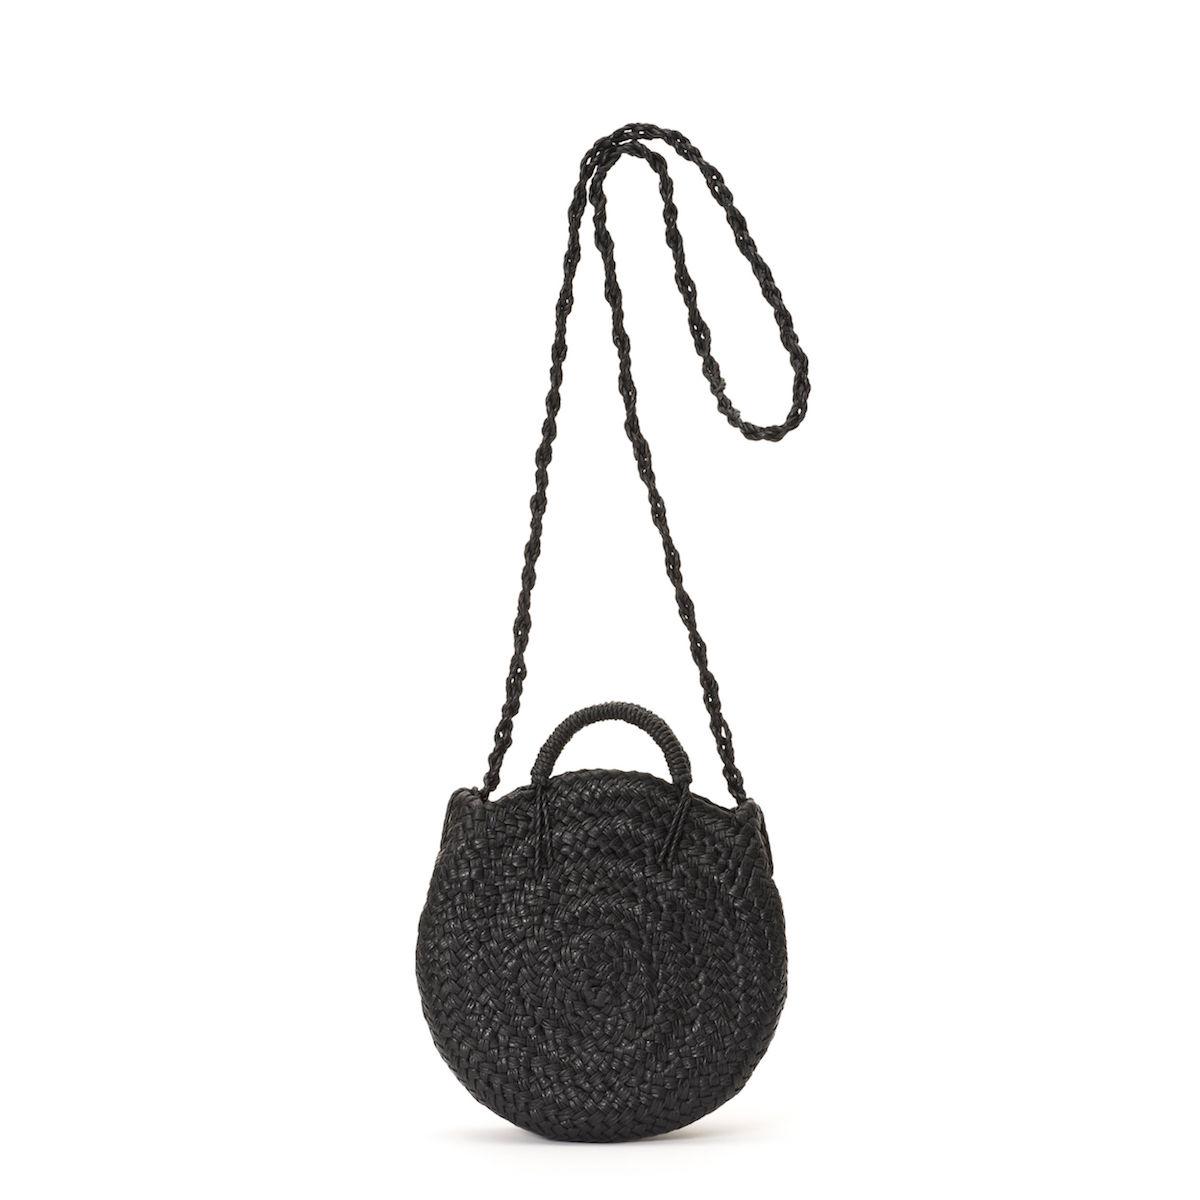 Aeta / LEATHER CIRCLE BASKET S (Black)